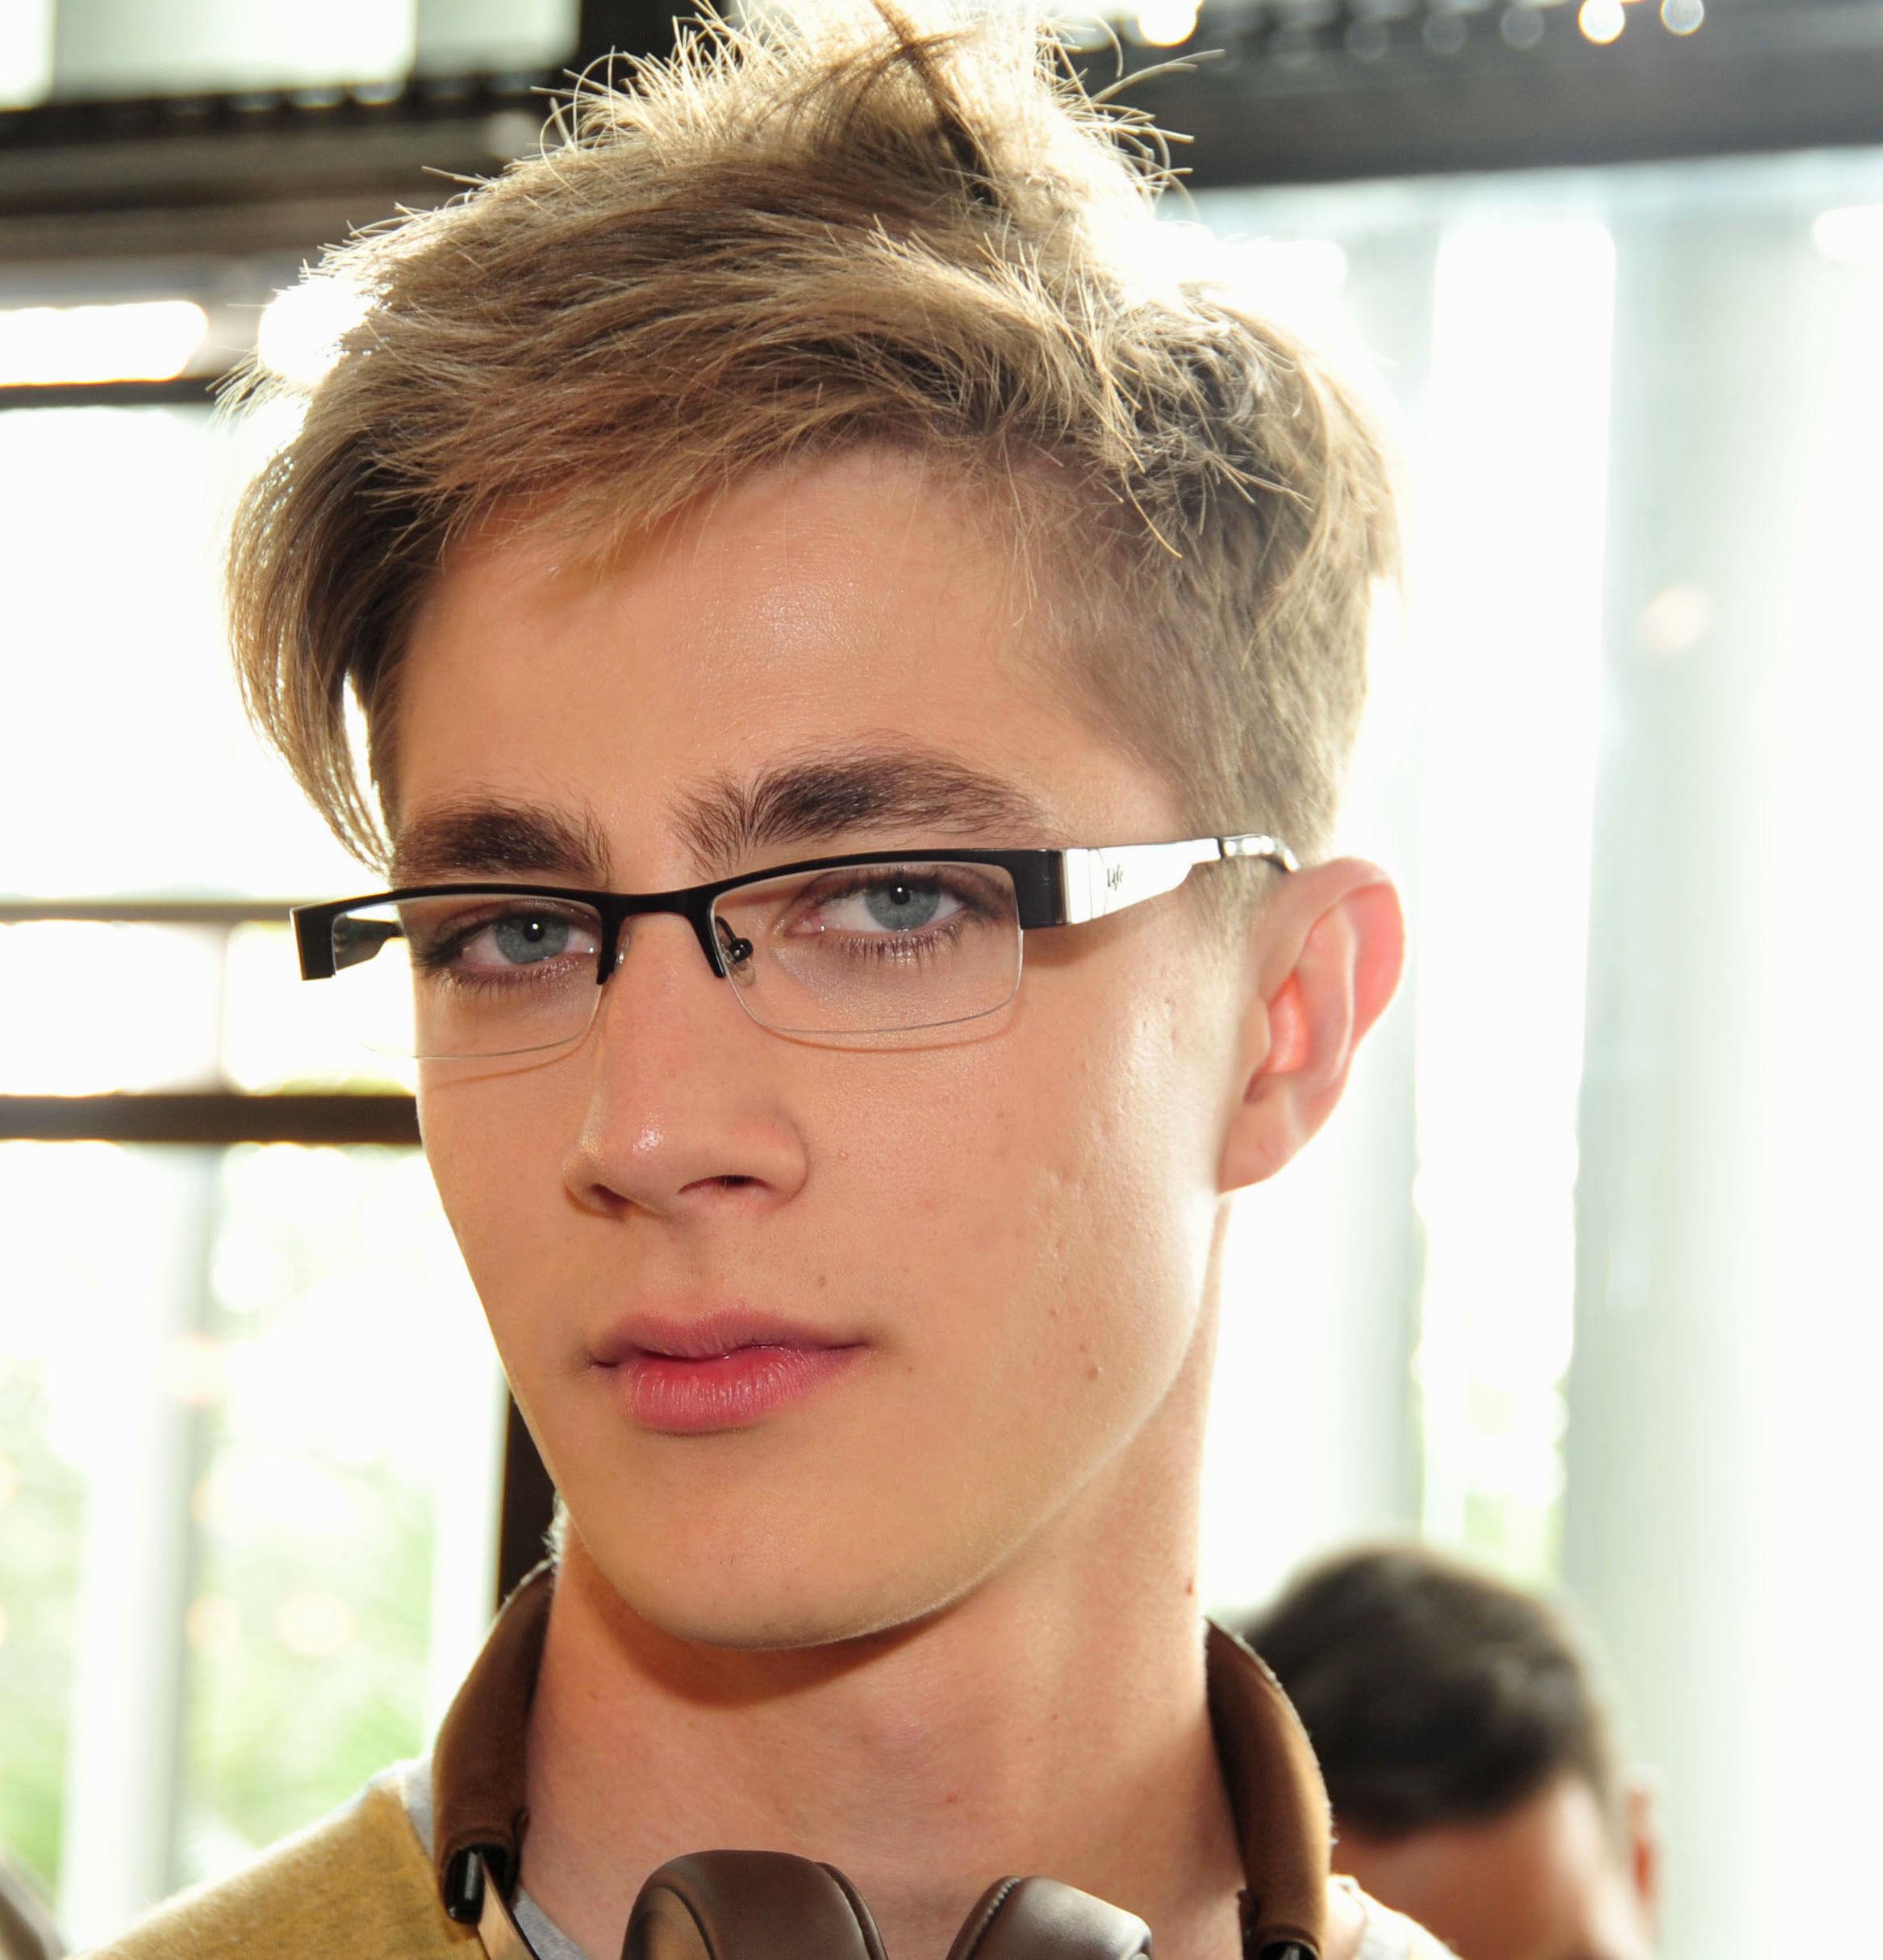 lovely corte cabelo liso masculino design-Fresh Corte Cabelo Liso Masculino Inspiração